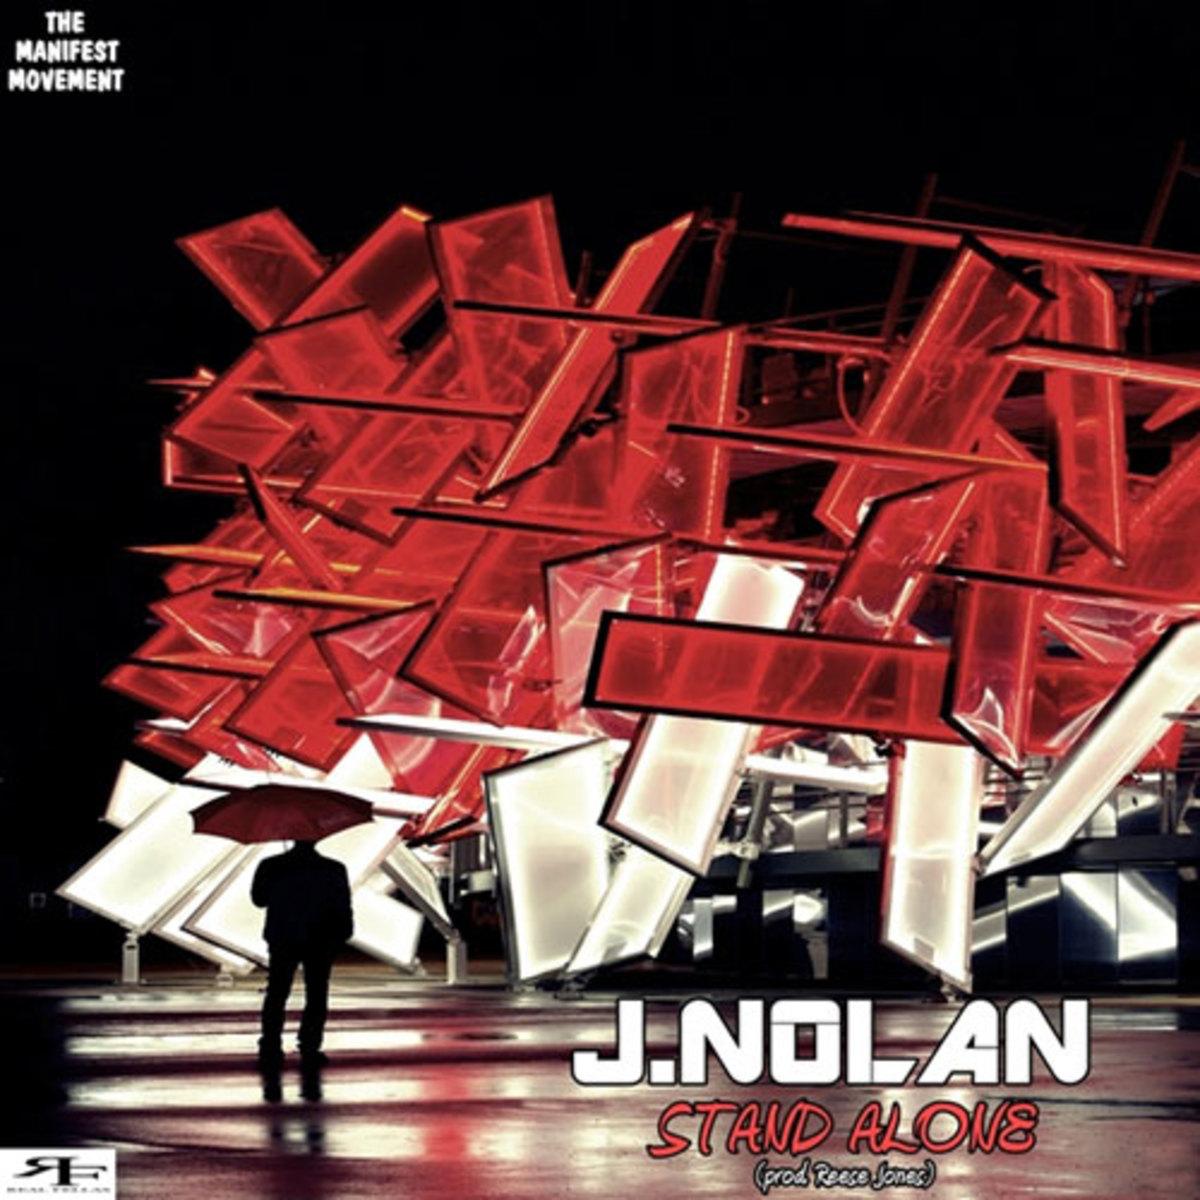 jnolan-standalone.jpg